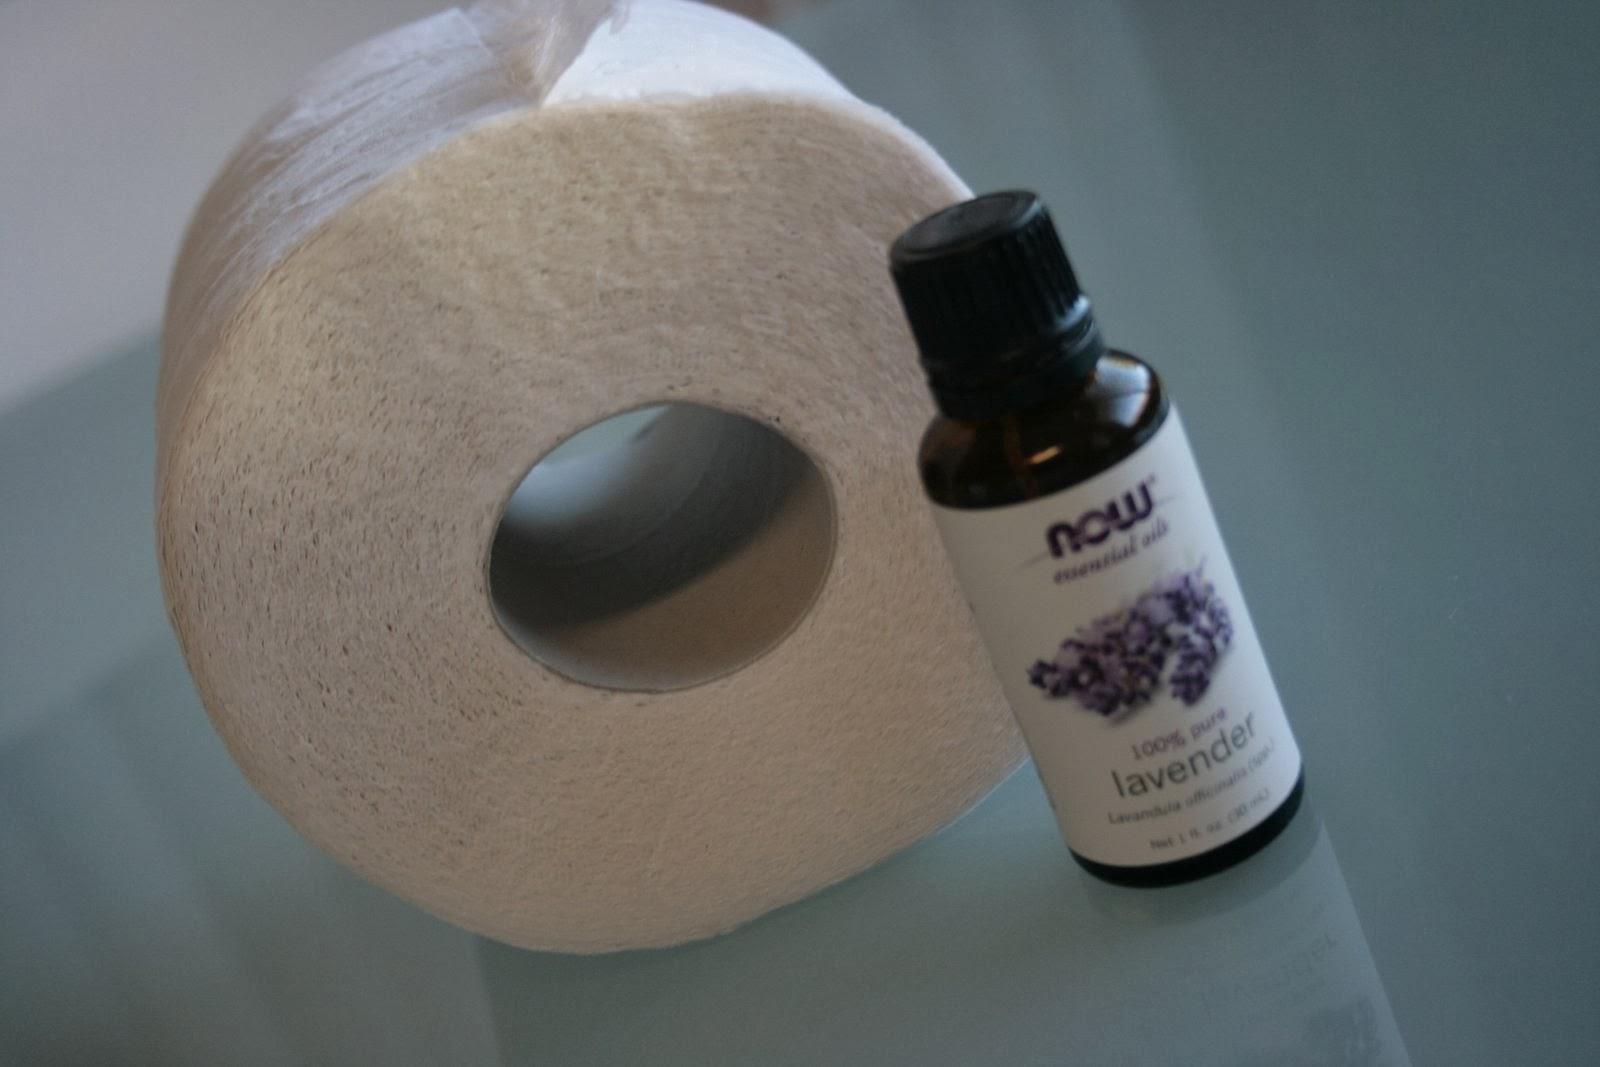 Diy bathroom air freshener 28 images homemade air for Air freshener for bathroom